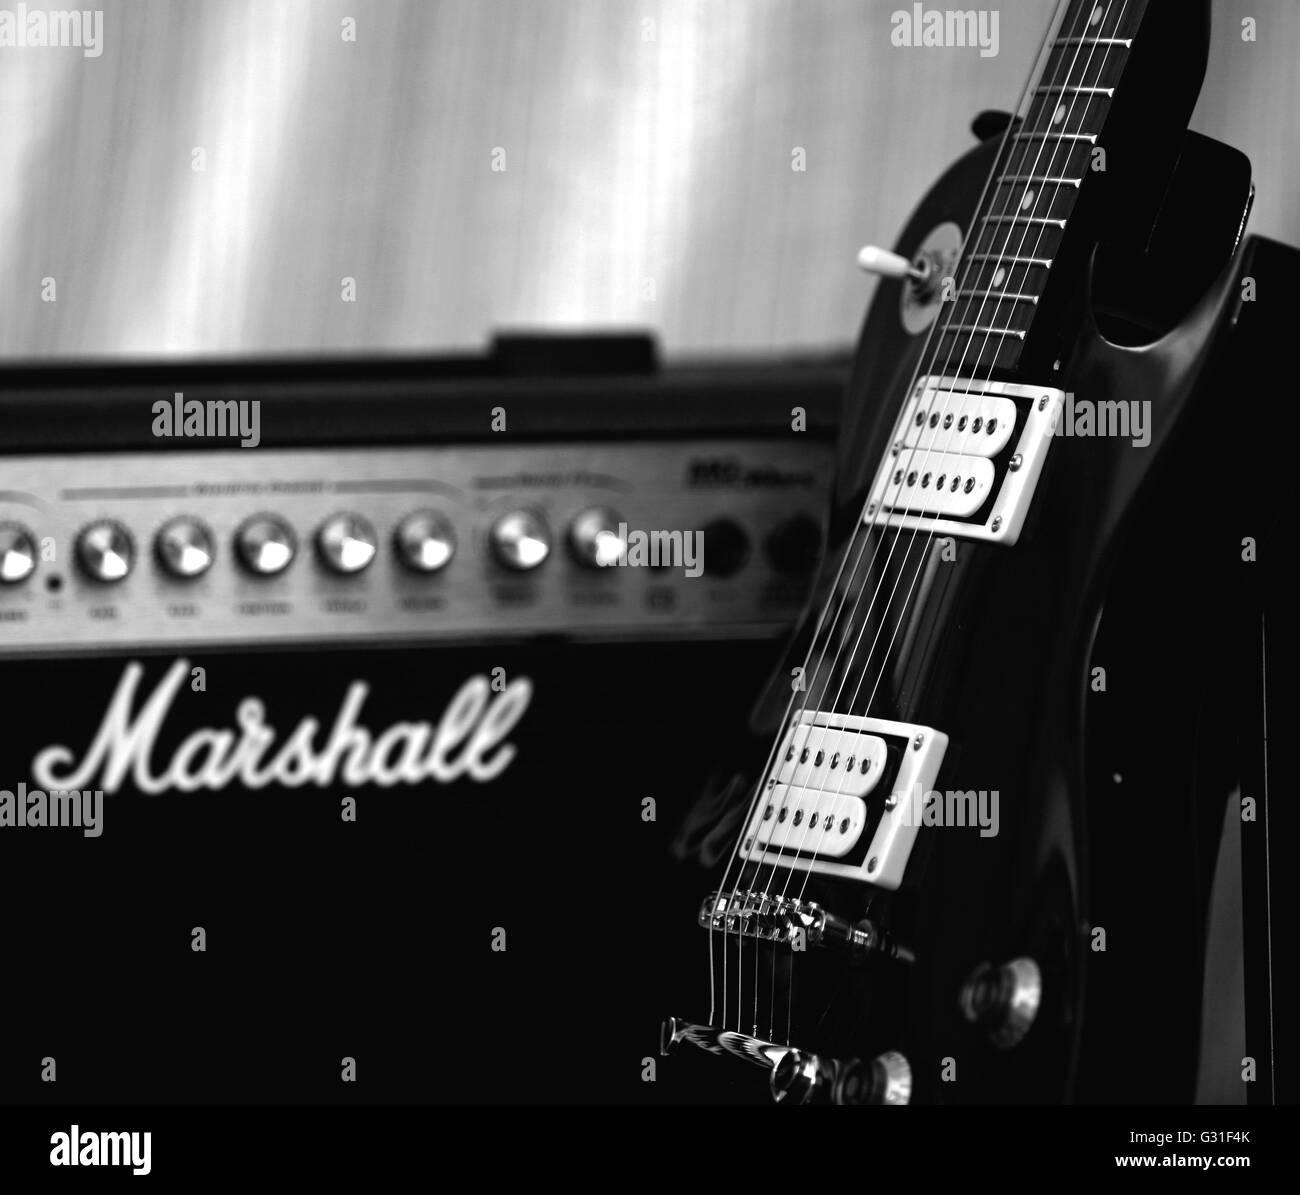 marshall amp stock photos marshall amp stock images alamy. Black Bedroom Furniture Sets. Home Design Ideas